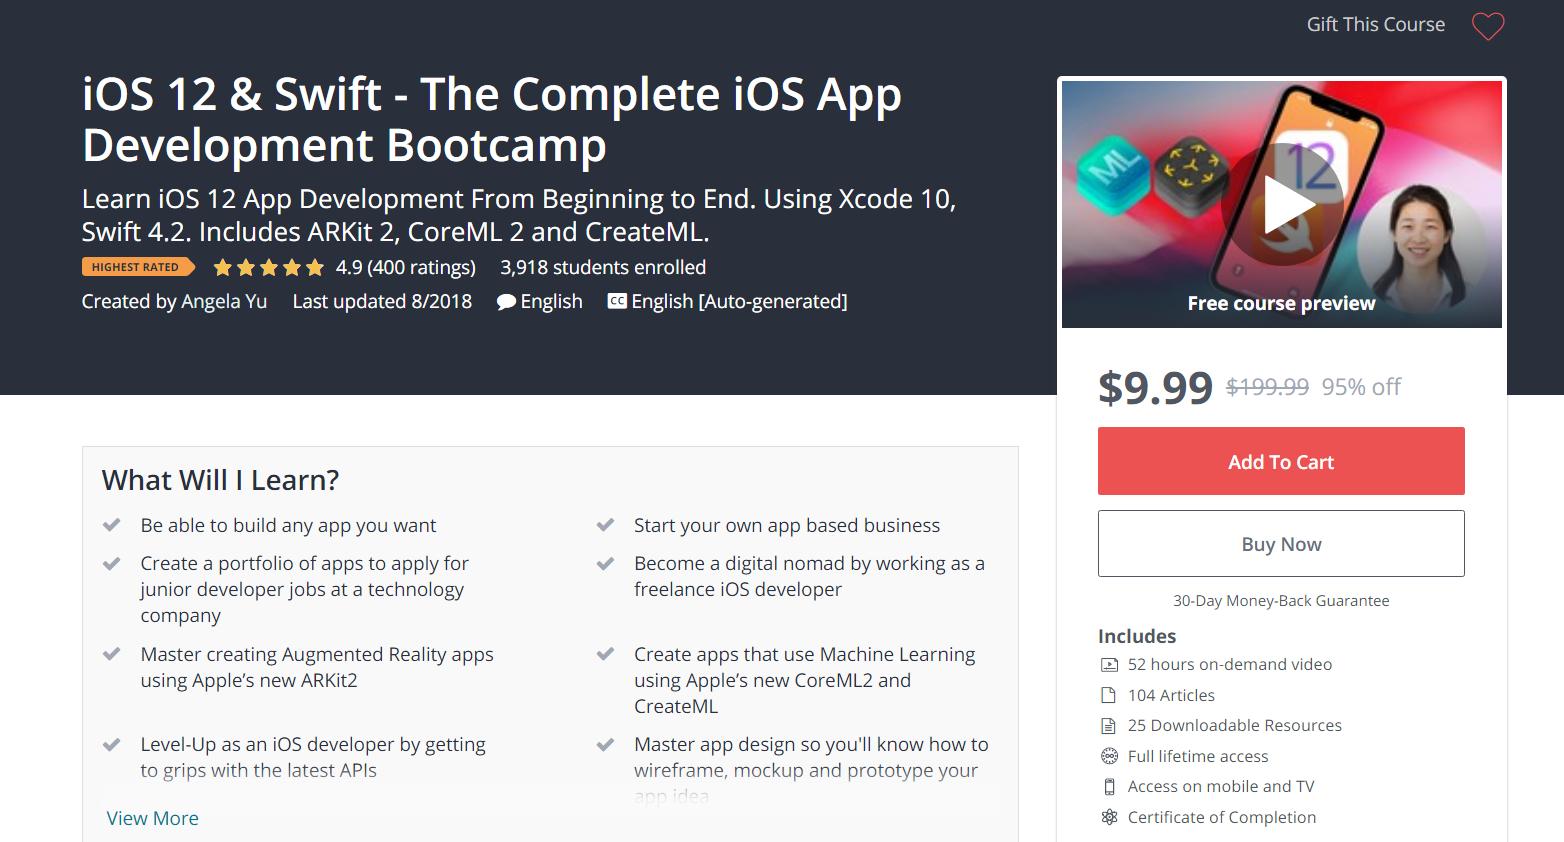 iOS 12 & #Swift - The Complete iOS #App #Development #Bootcamp